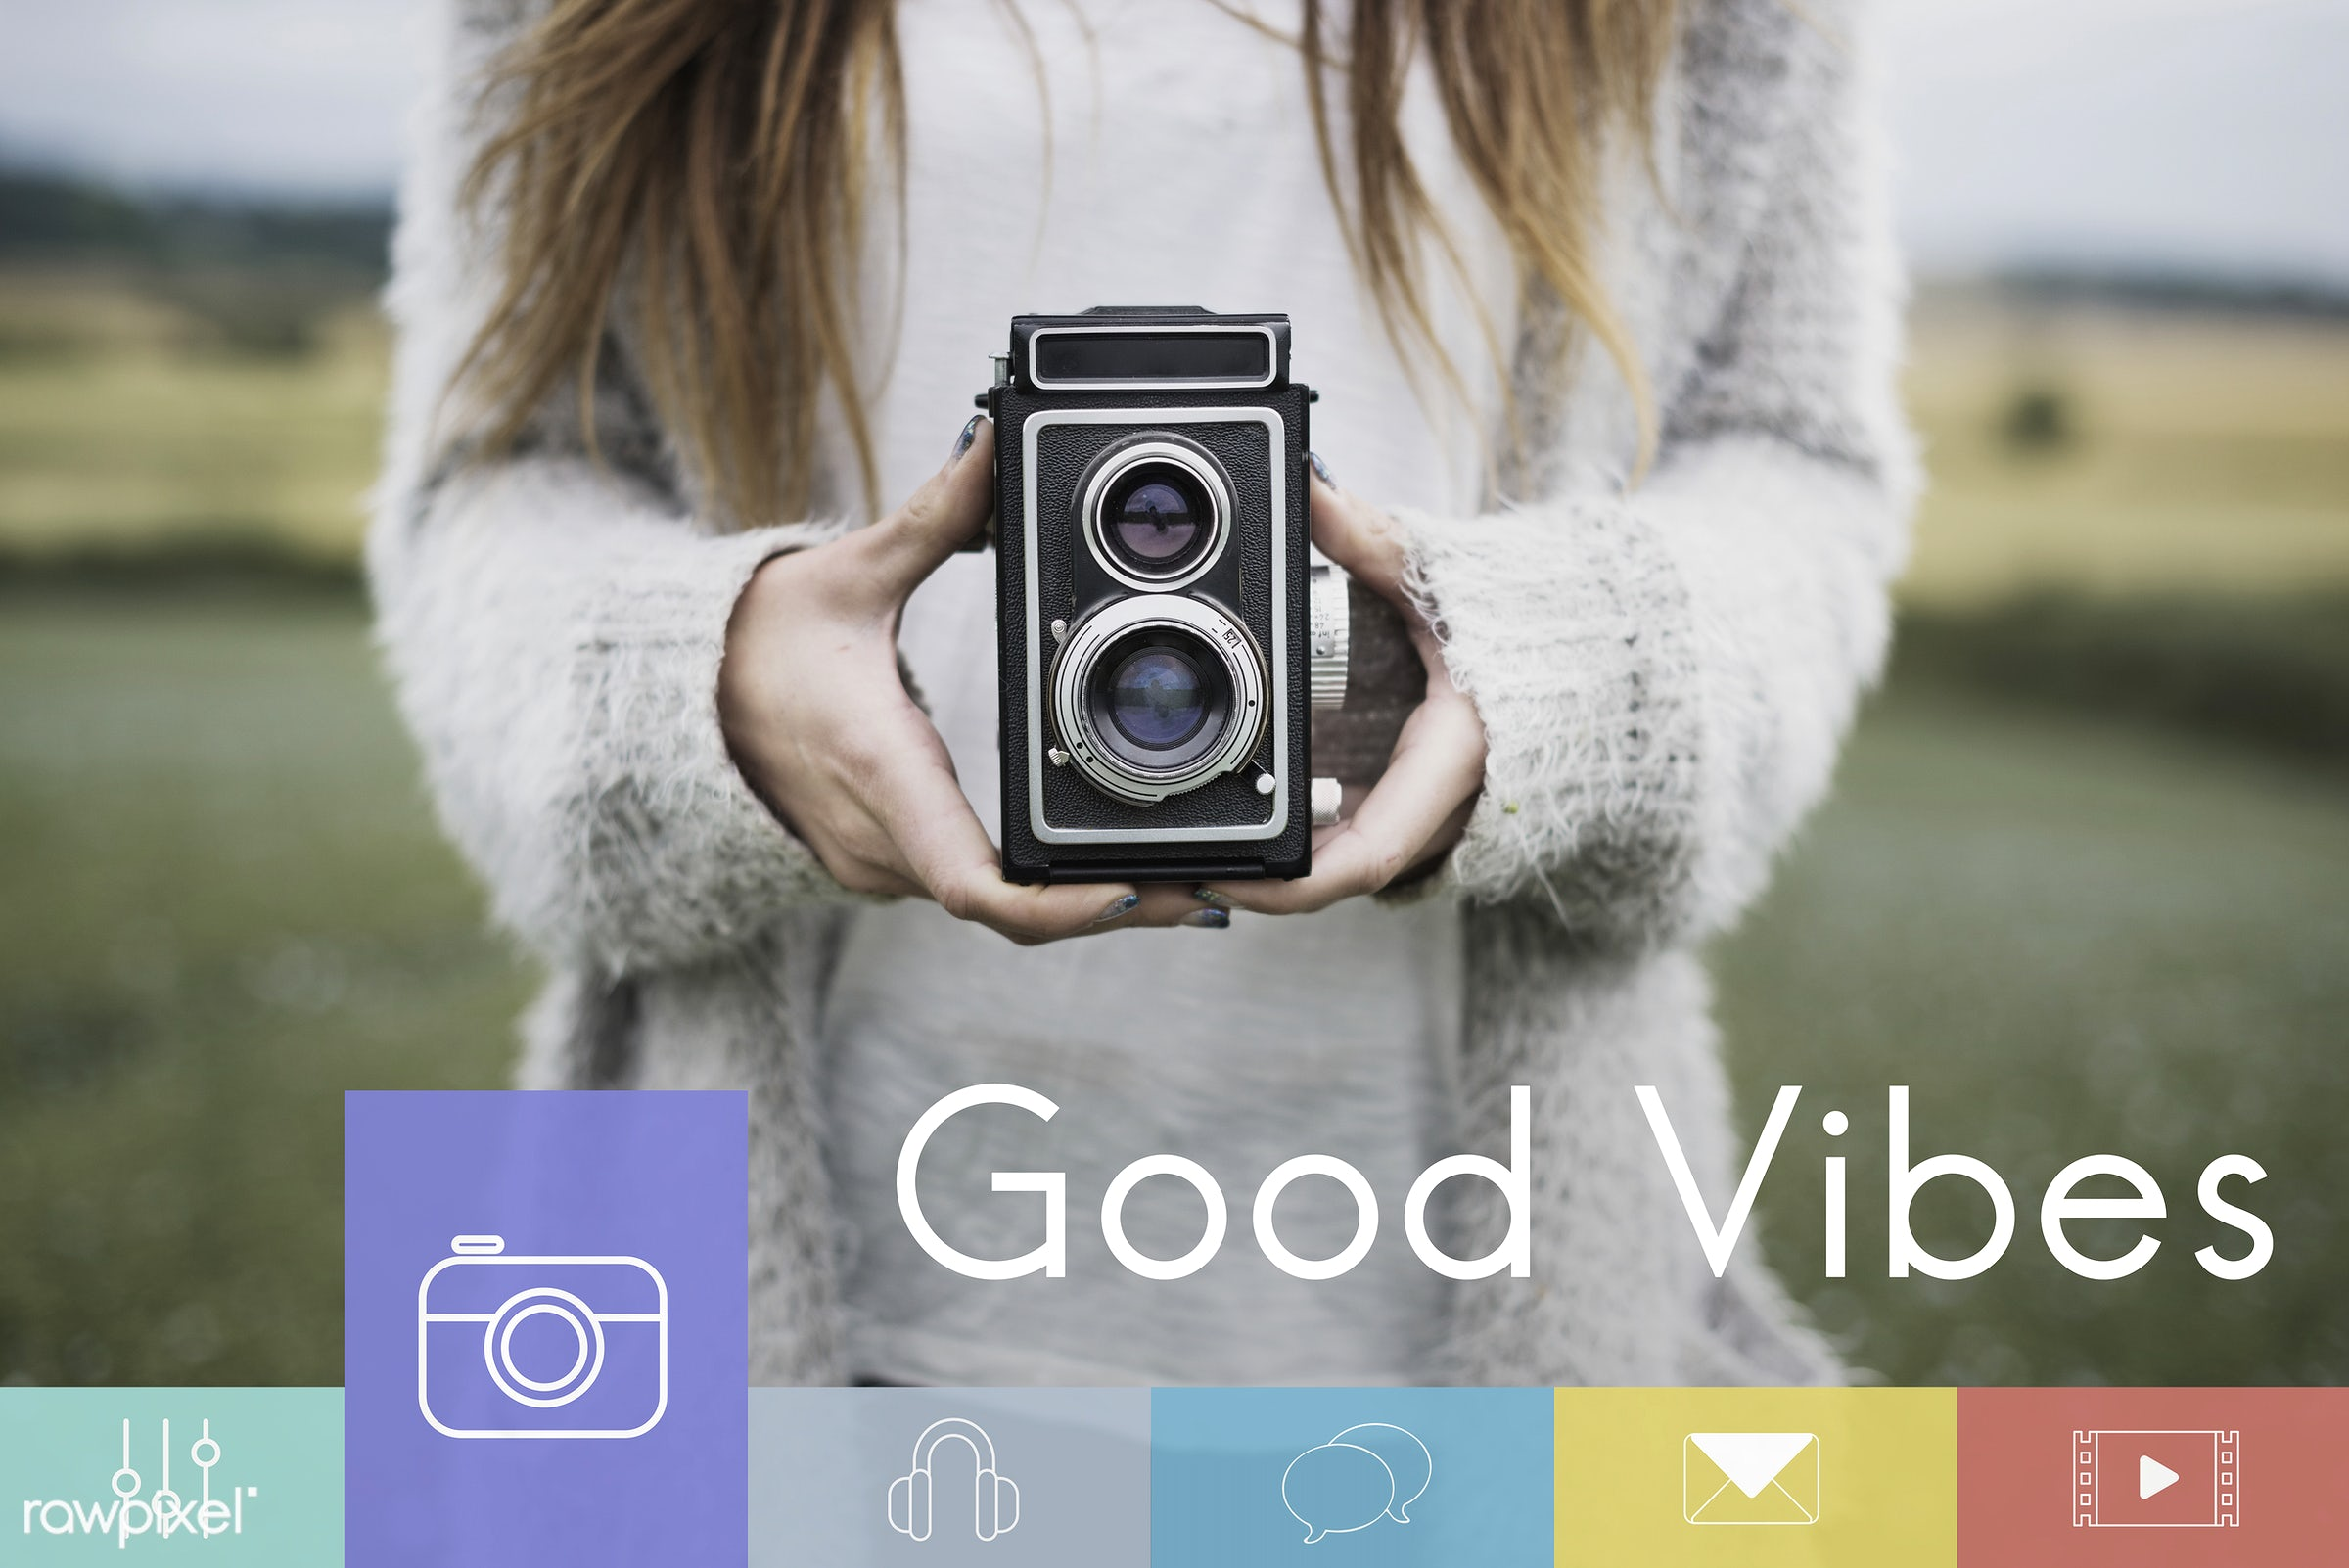 activities, camera, caucasian, cold, dark blonde, enjoyment, equipment, female, feminine, free spirit, freedom, good vibes,...